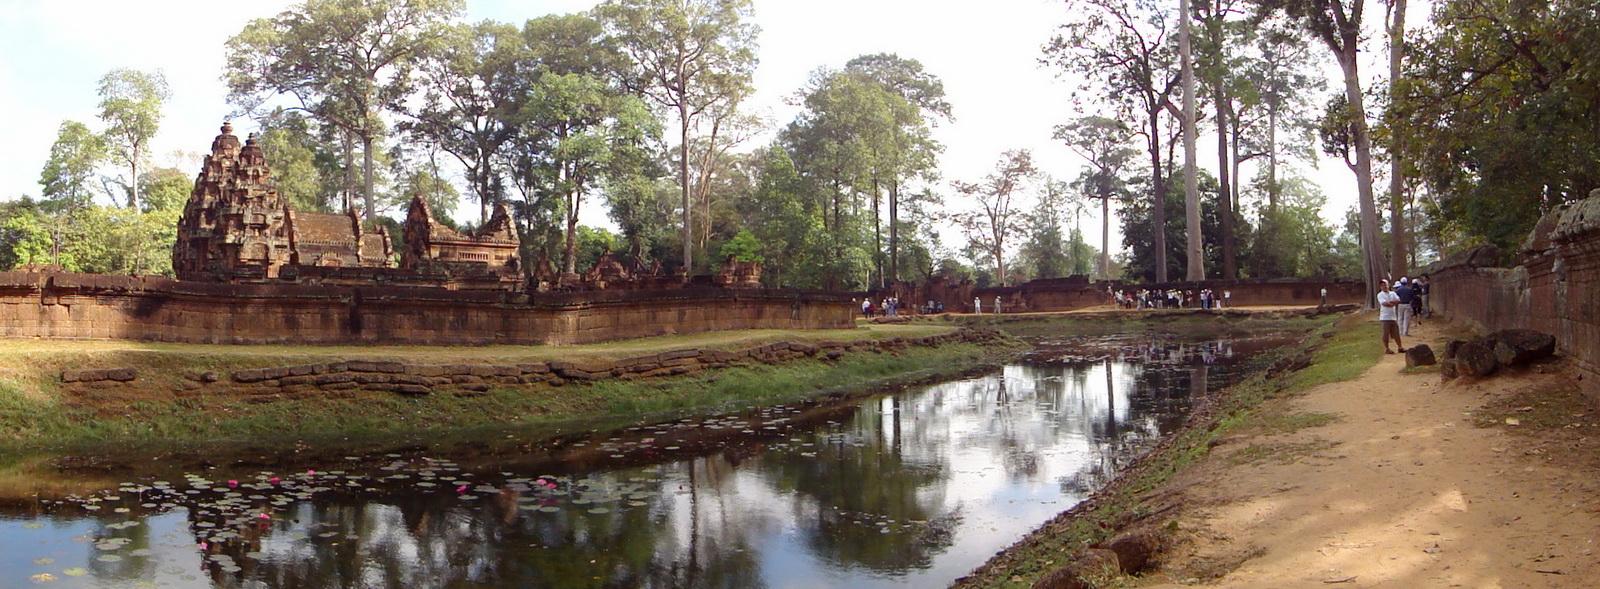 Banteay Srei 10th century Khmer architecture Tribhuvanamahesvara 02